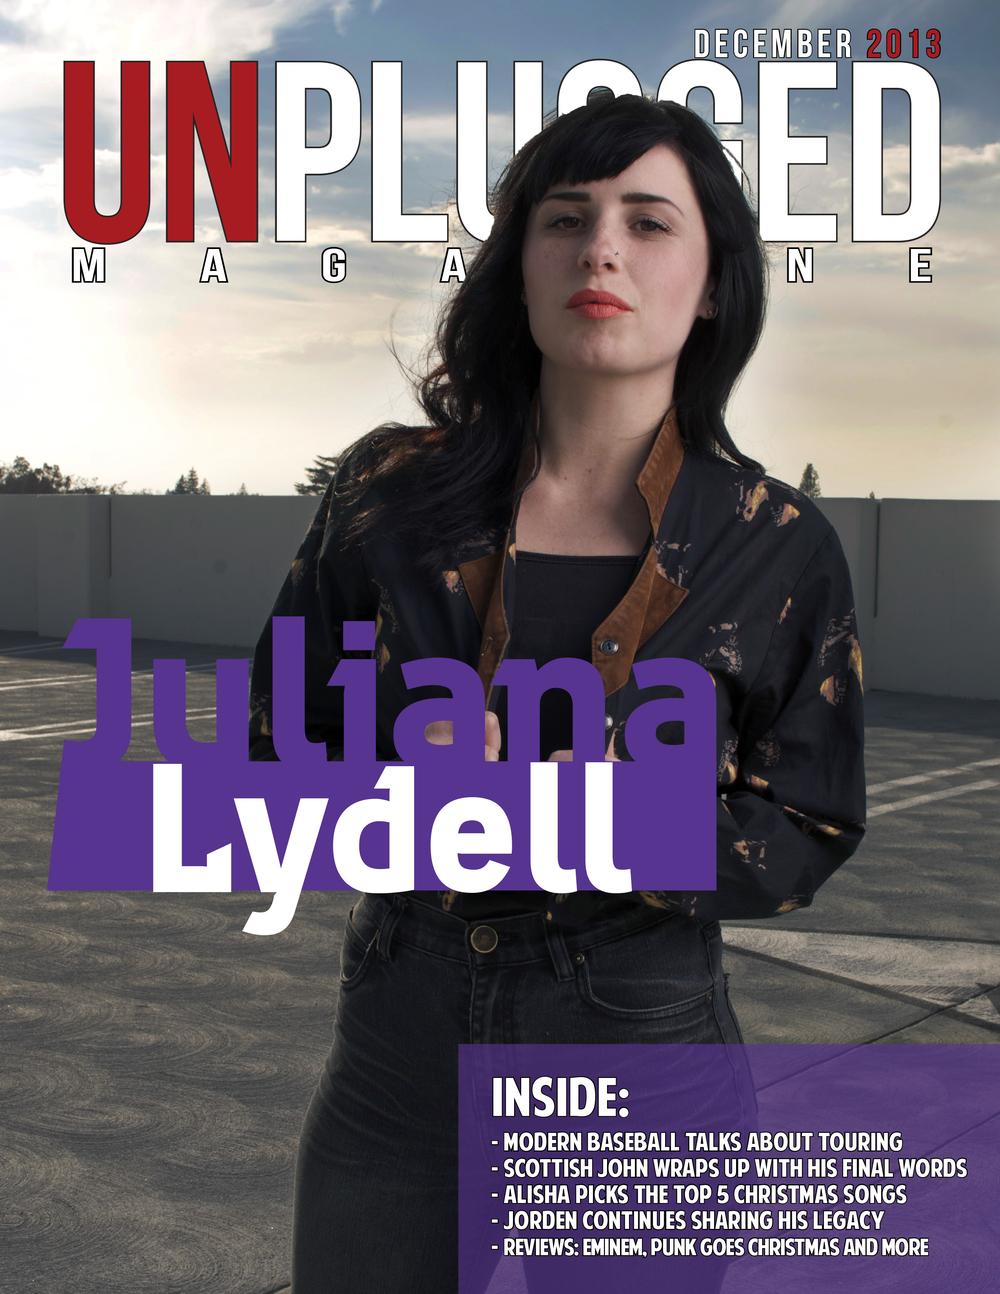 December 2013 Issue #12